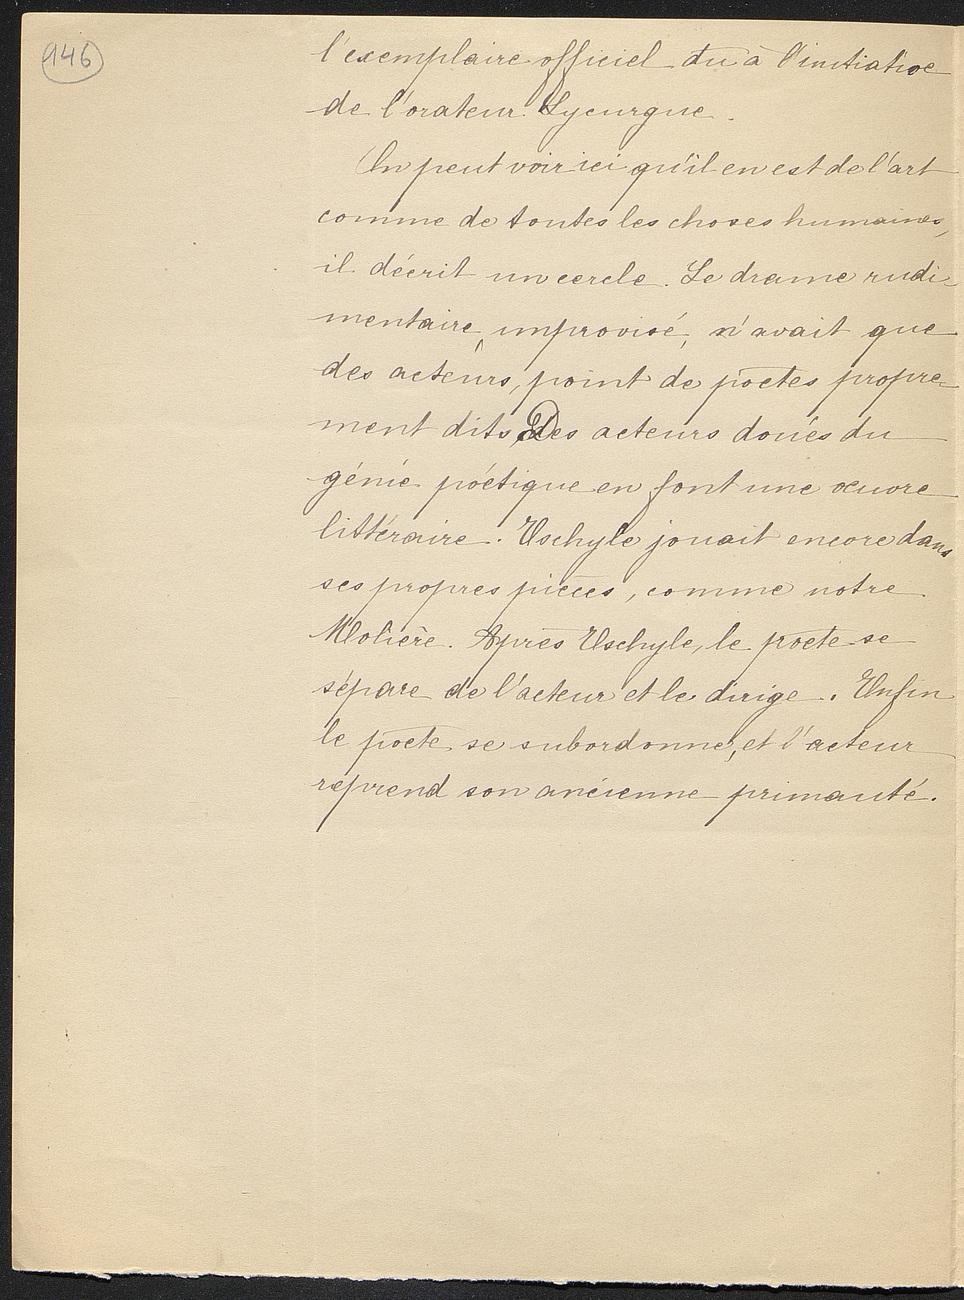 [folio 146 : foliotation de la main de bibliothécaire]